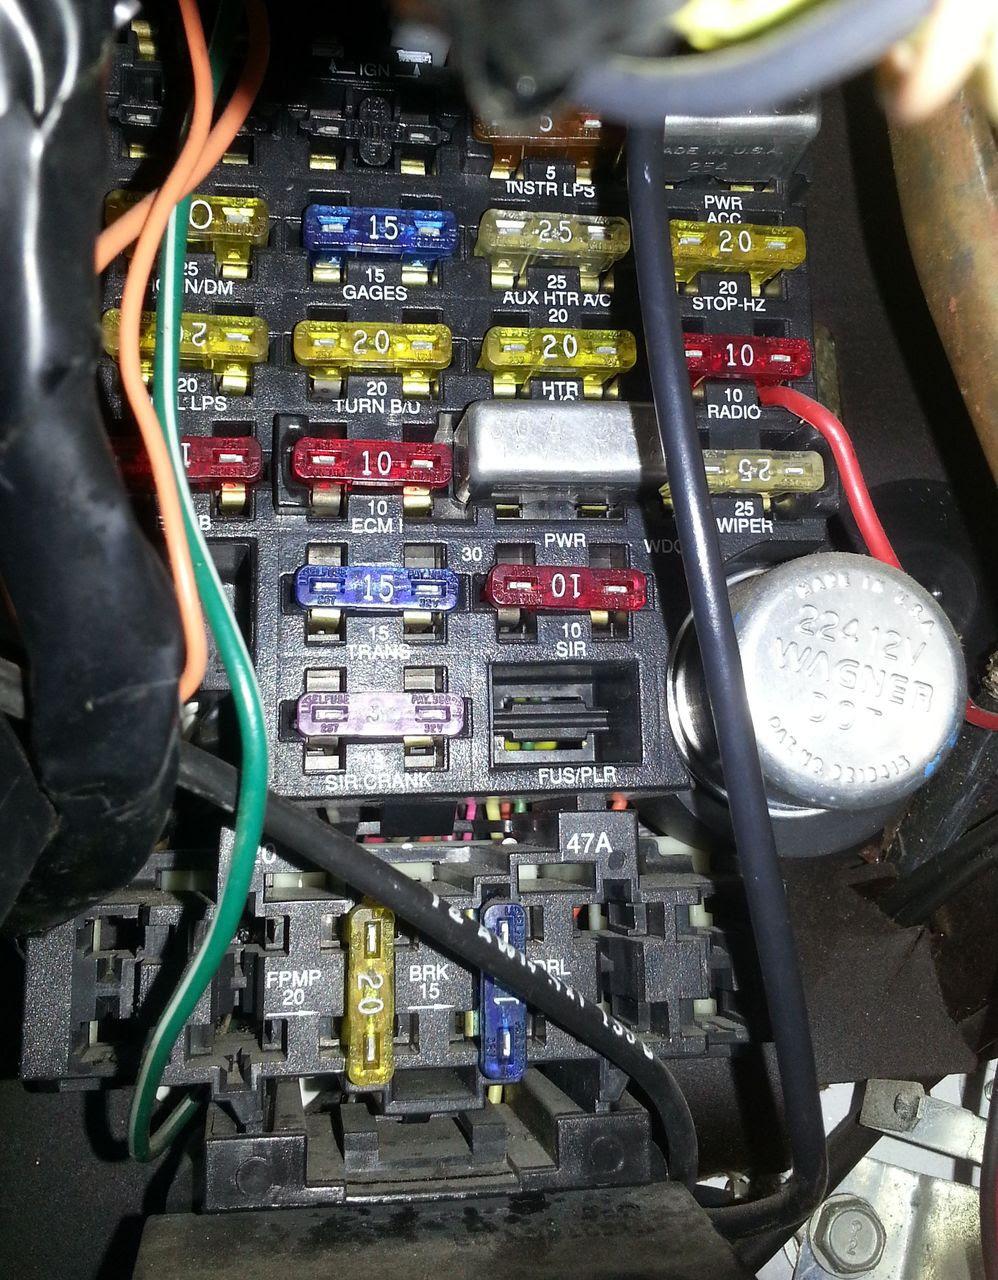 1994 Chevy Astro Fuse Box Diagram Melex Electric Golf Cart Wiring Diagram Mazda3 Sp23 Yenpancane Jeanjaures37 Fr